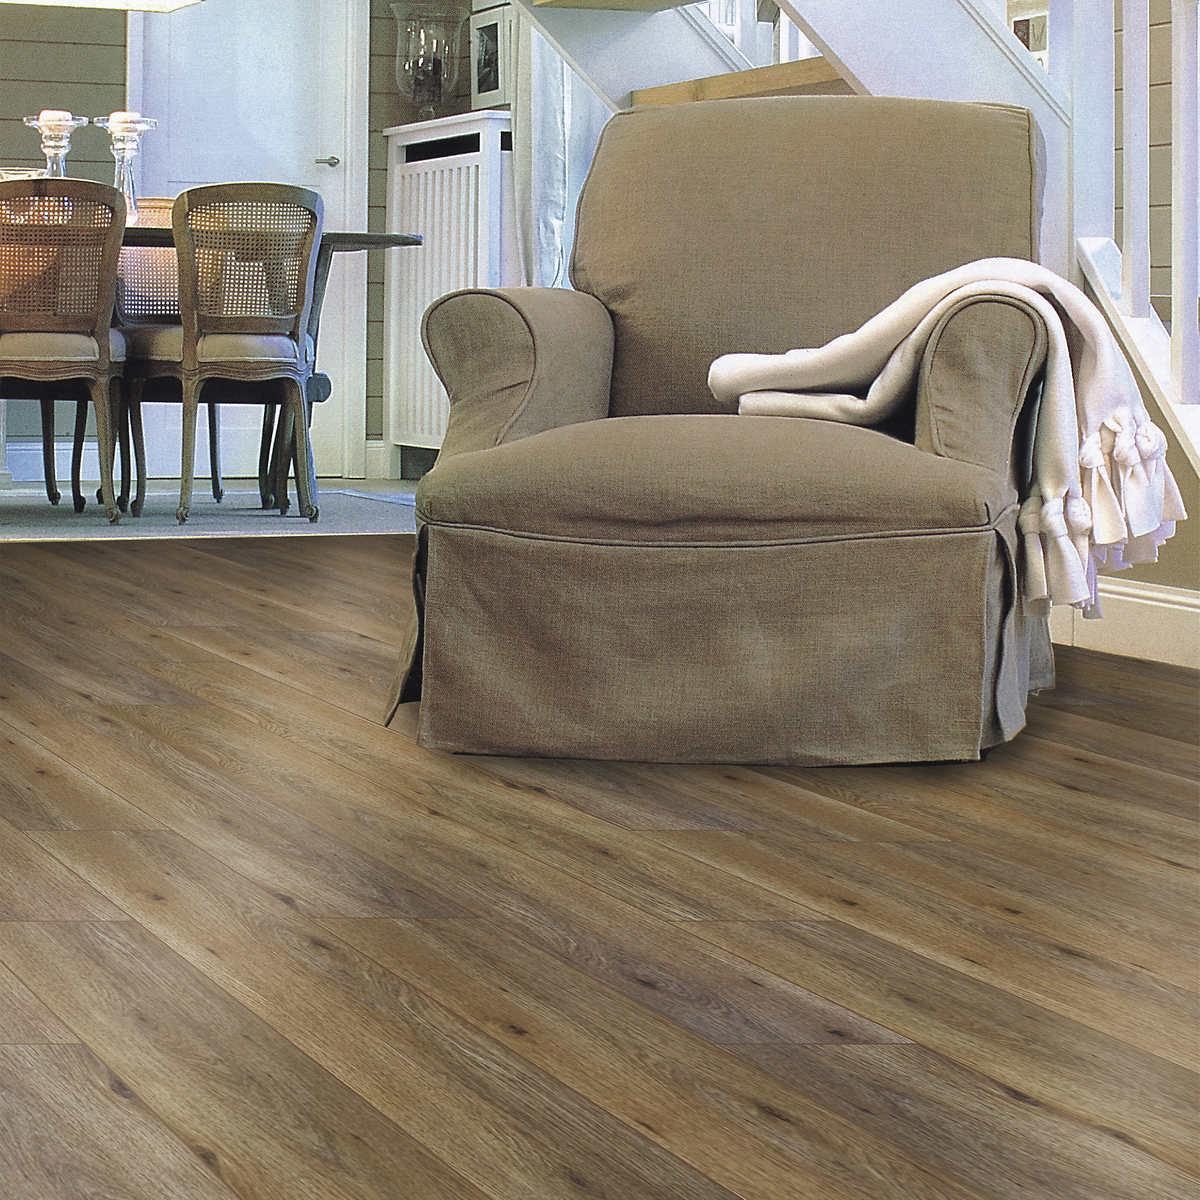 G E F Collection Registered Embossed Oak 16 5 Cm 6 5 In Laminate Flooring